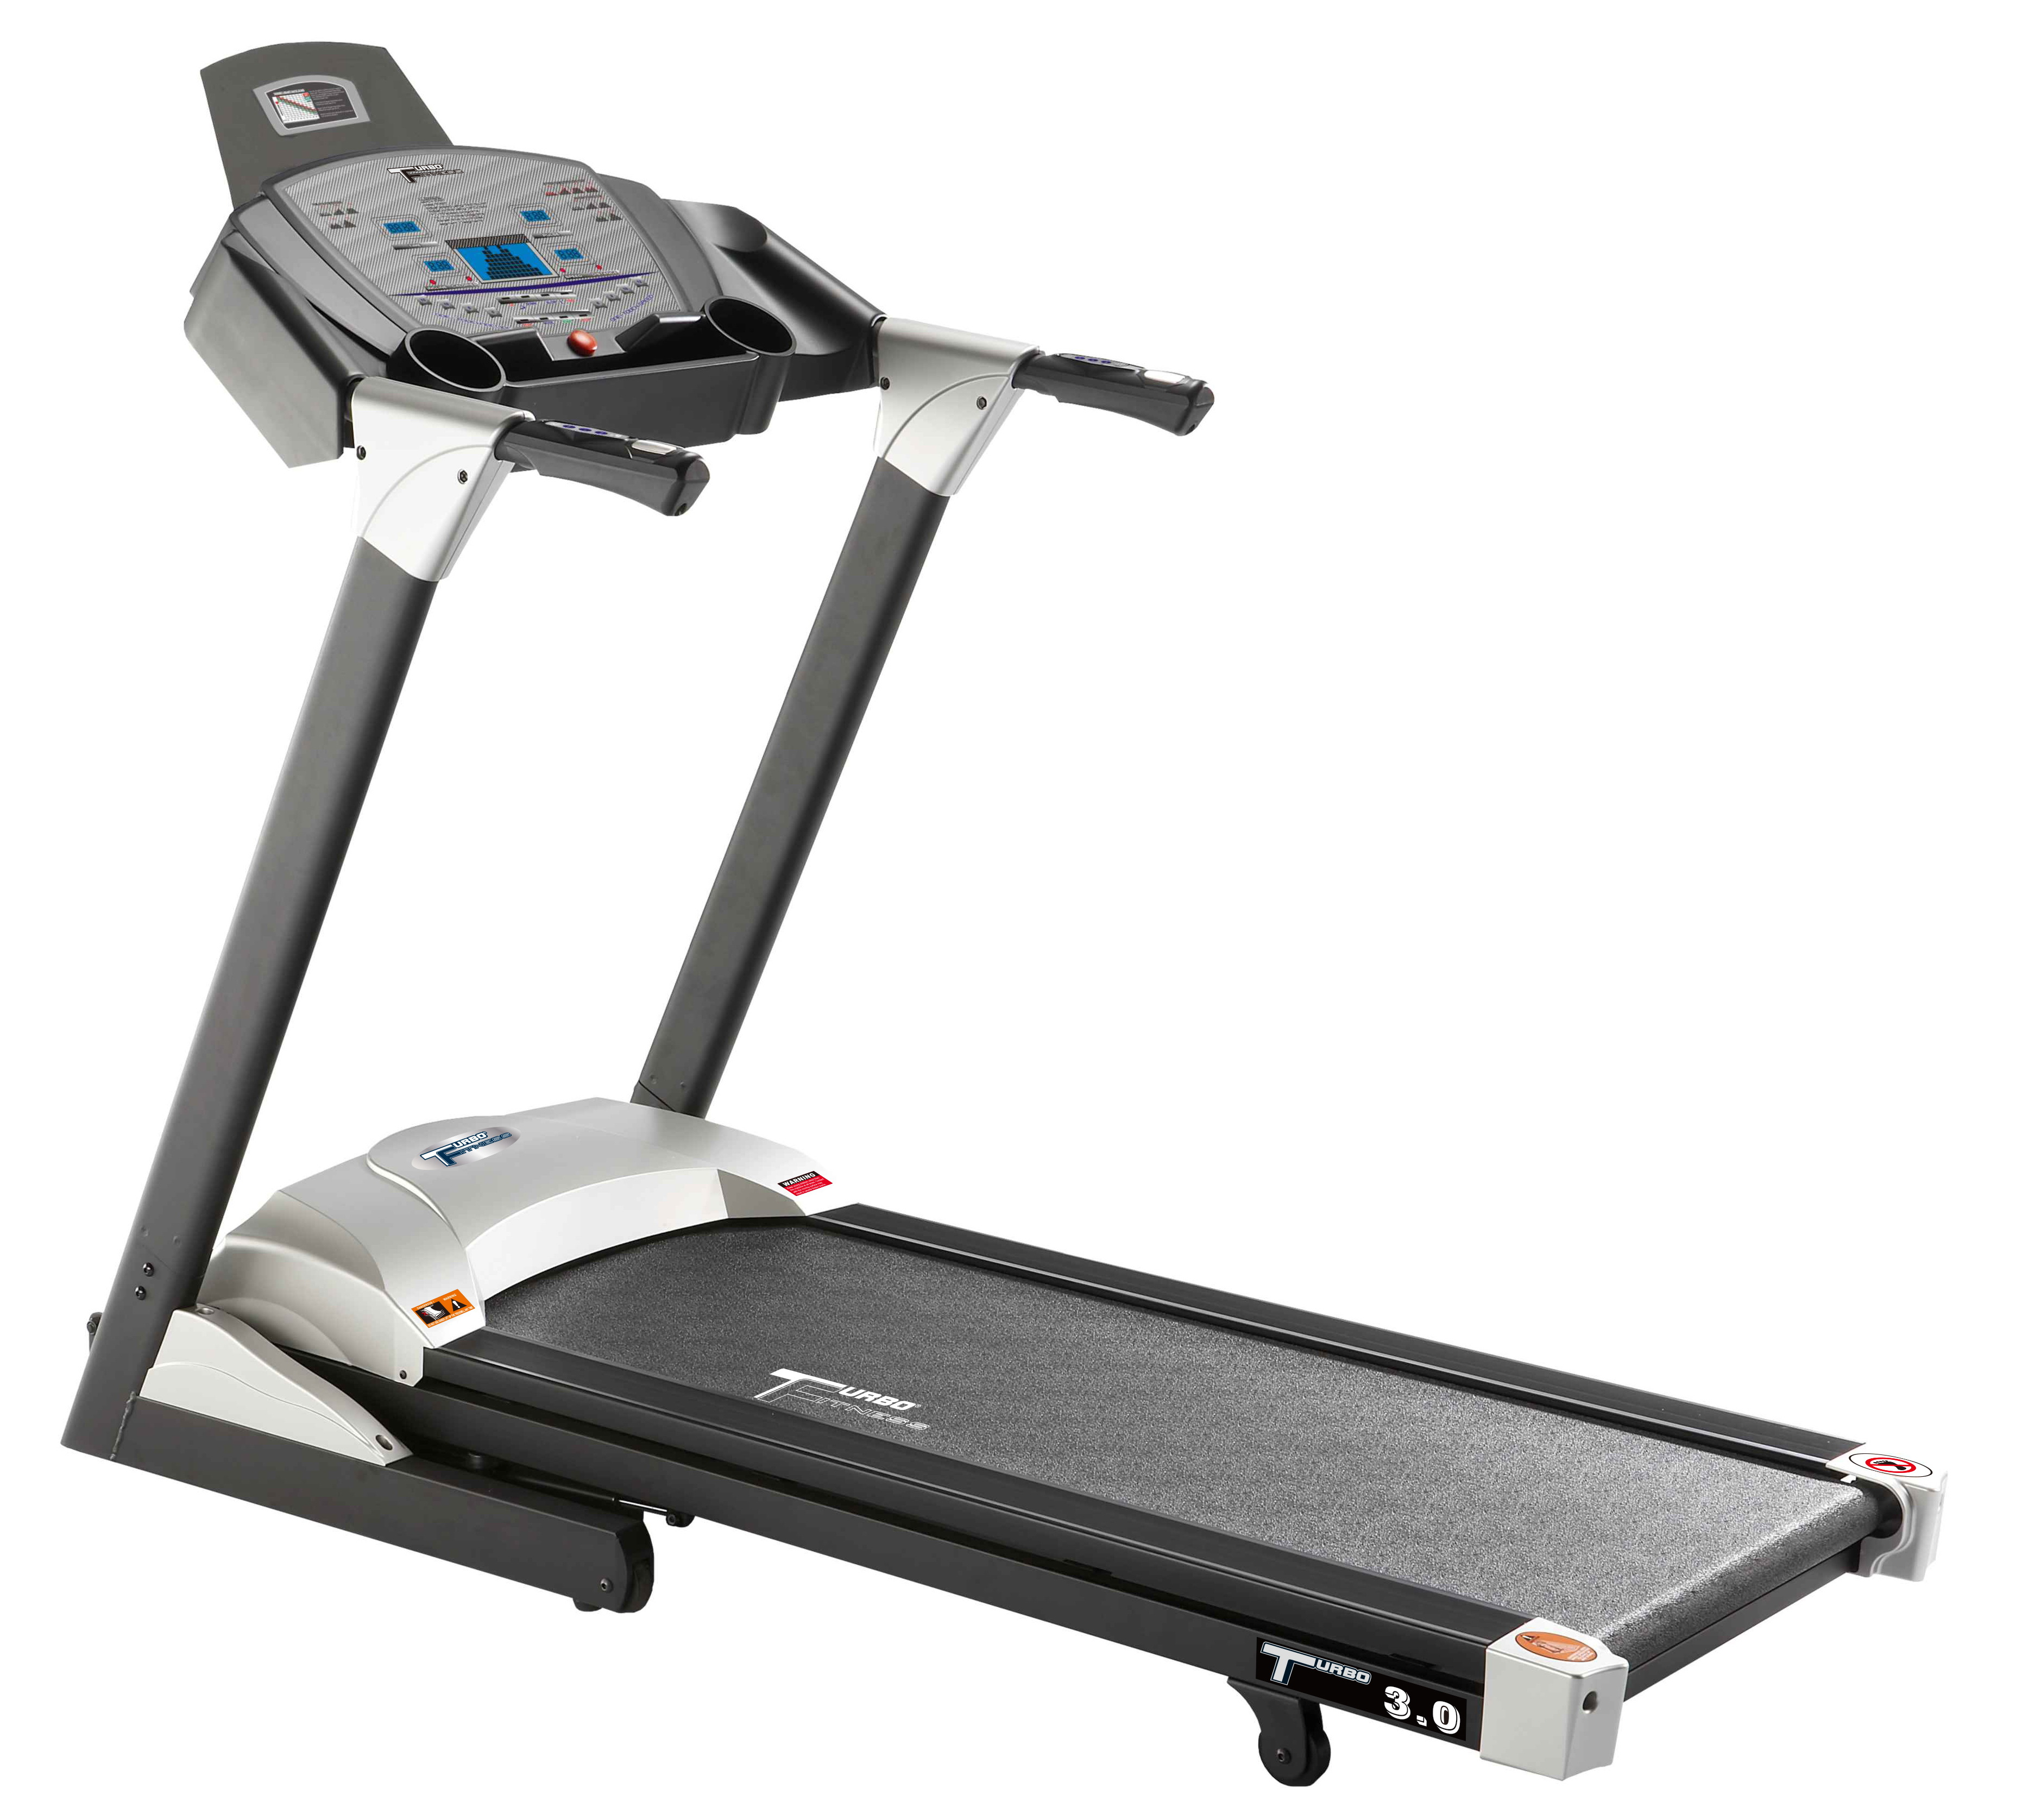 Turbo Fitness T3.0i treadmill with power elevation